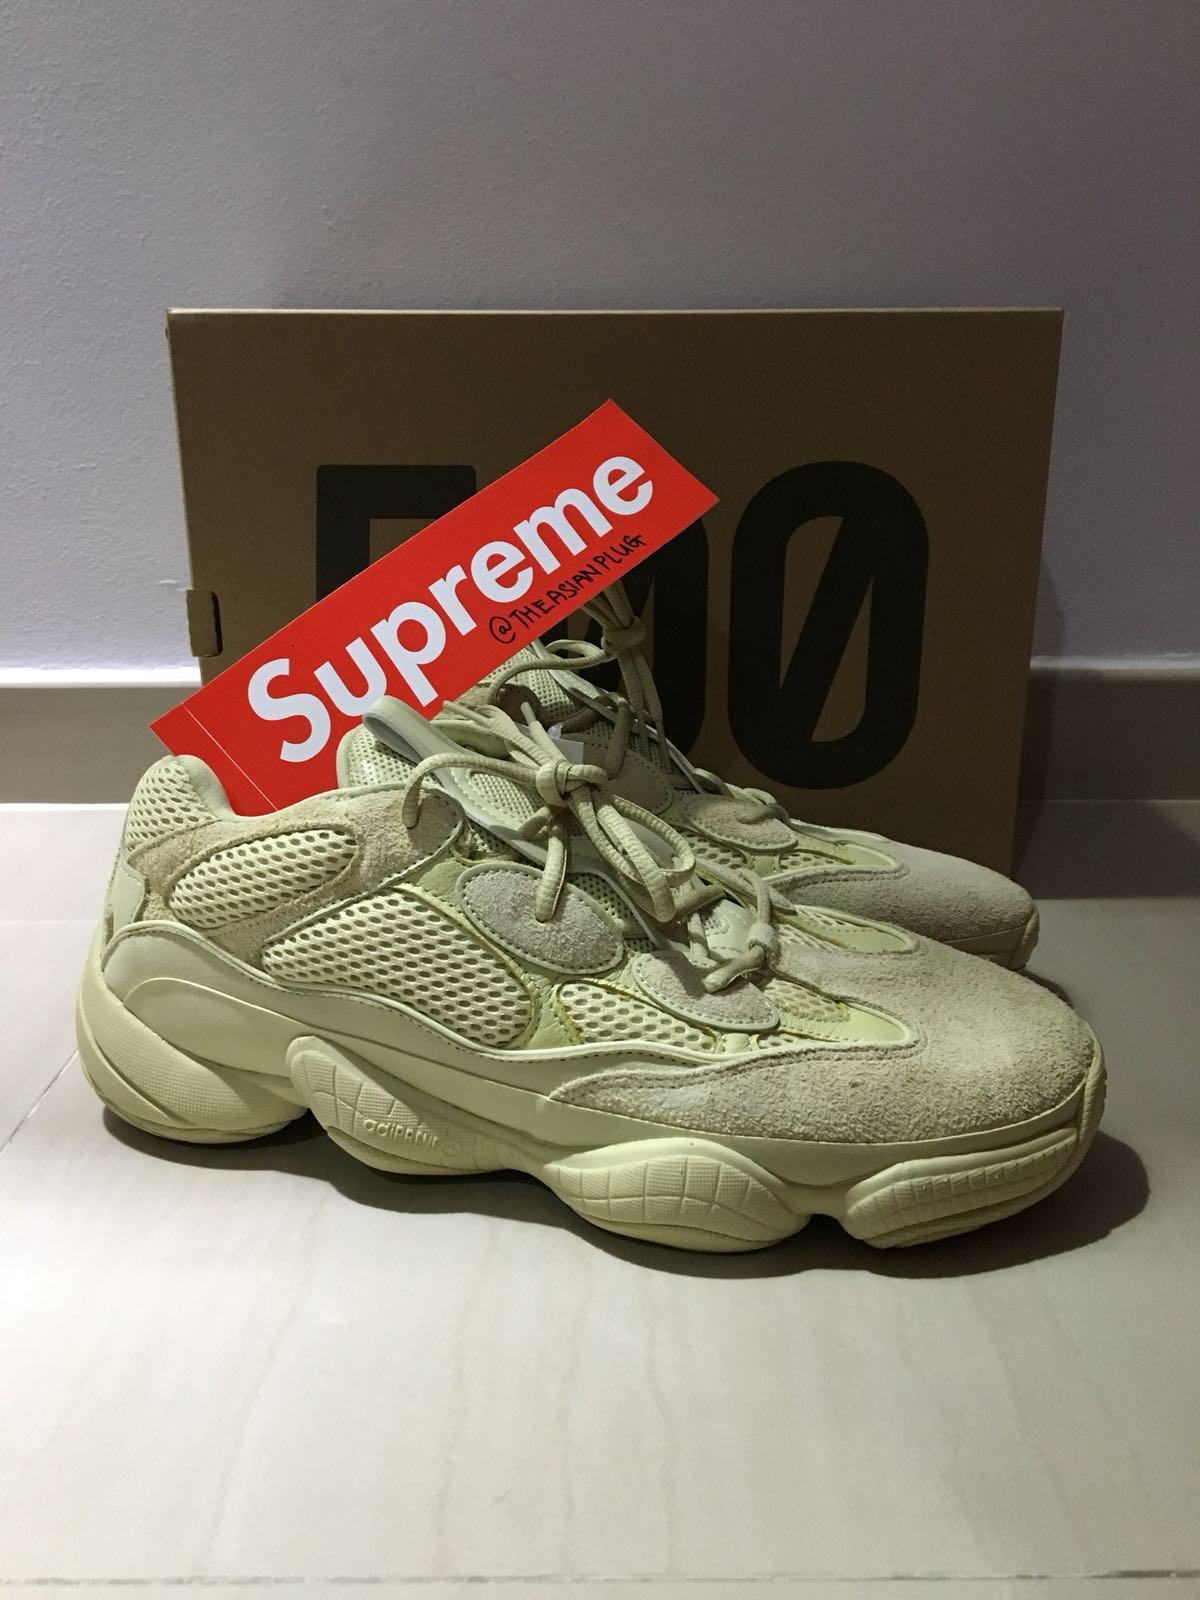 cc1bfd711e8c0 Adidas Yeezy 500